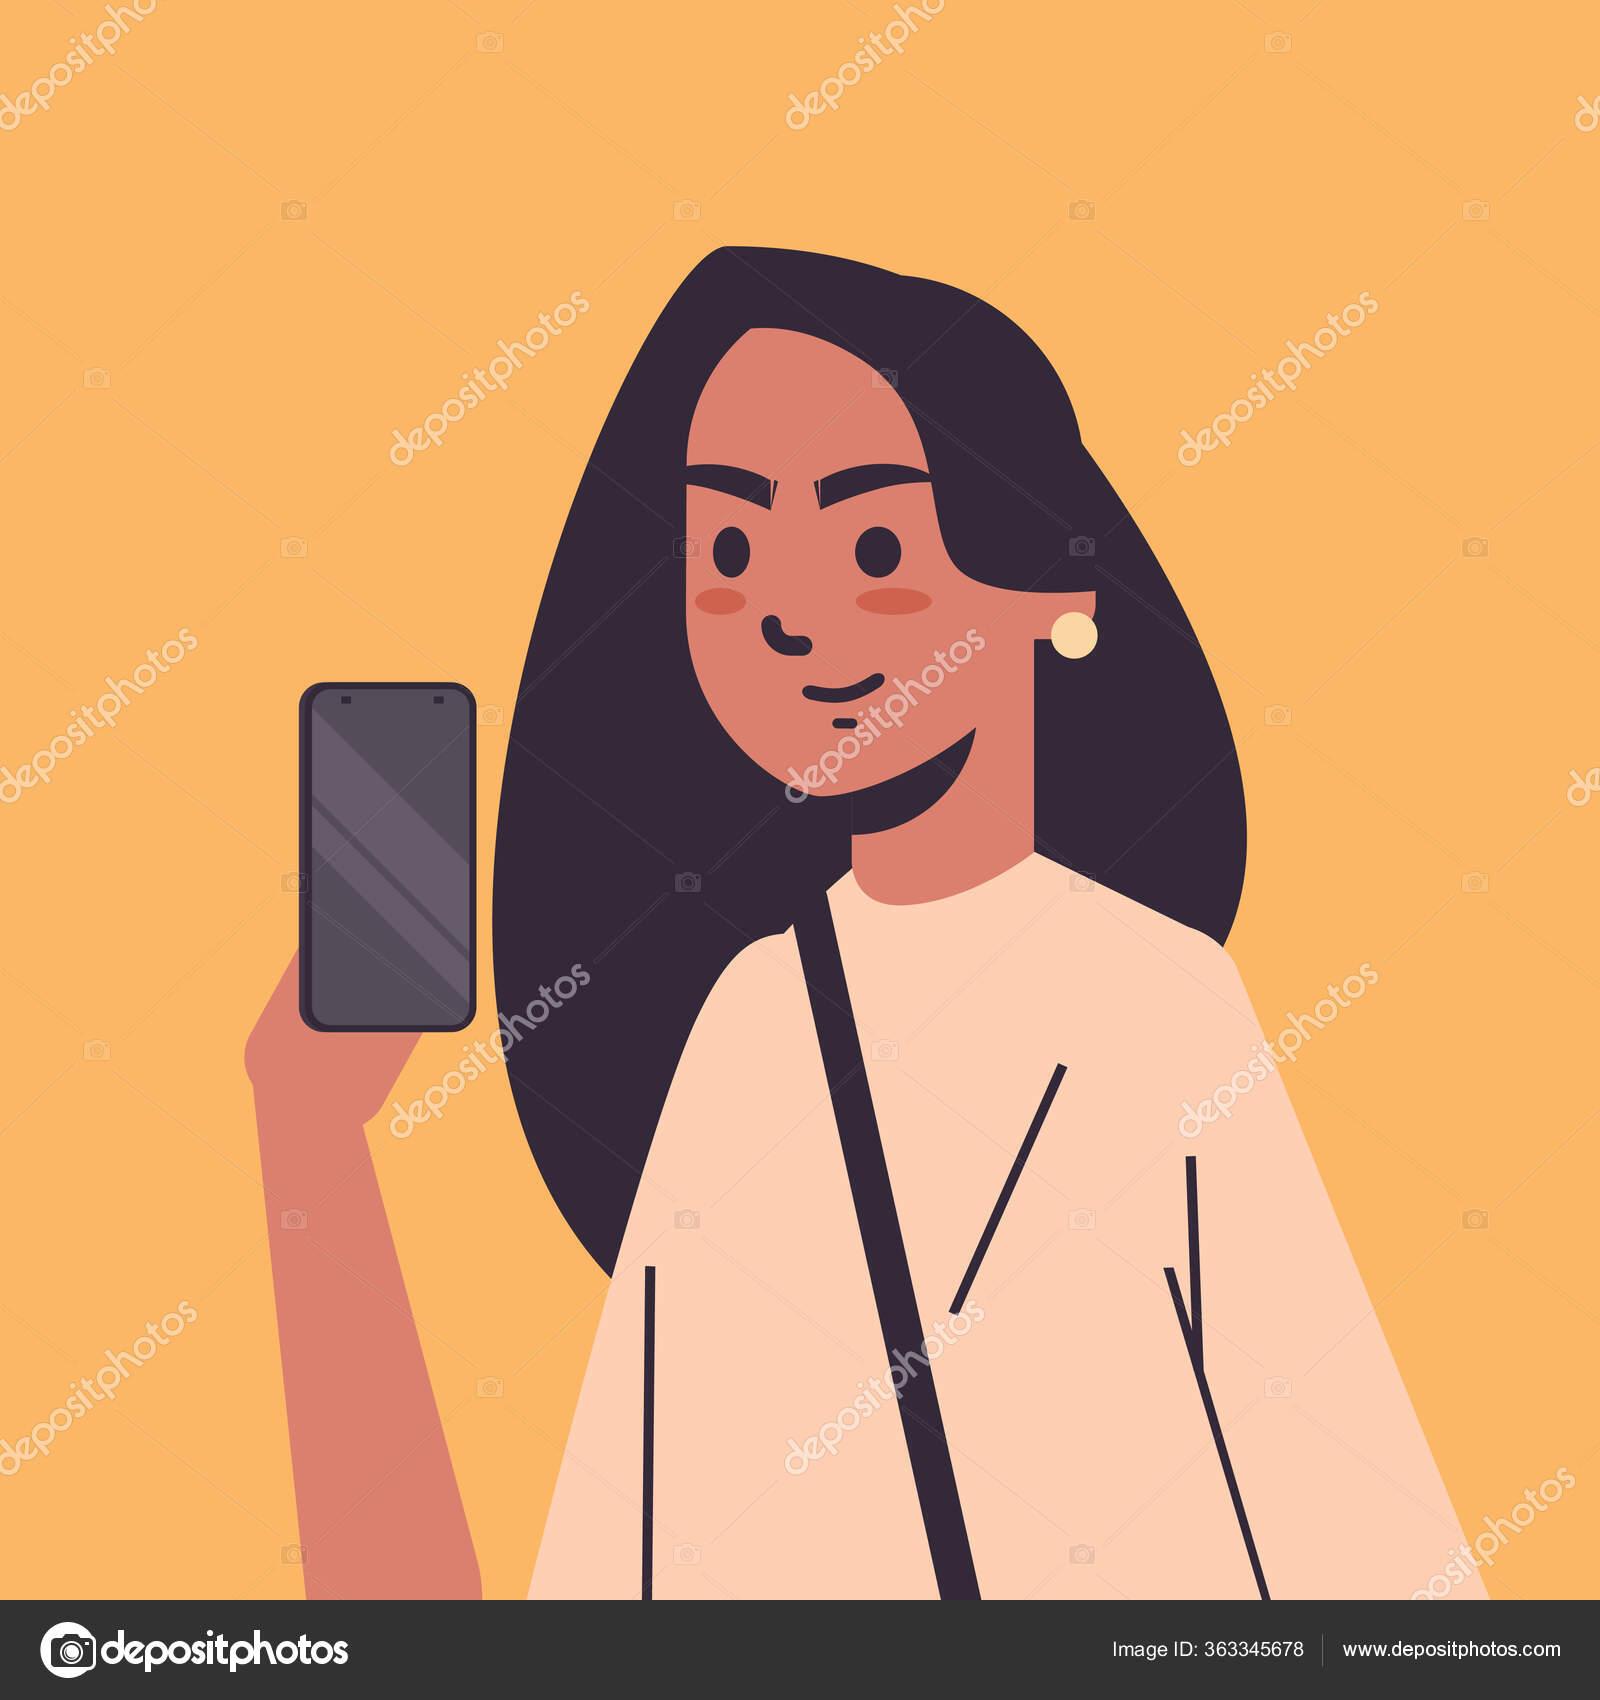 22+ Indian Woman Cartoon Character Gif